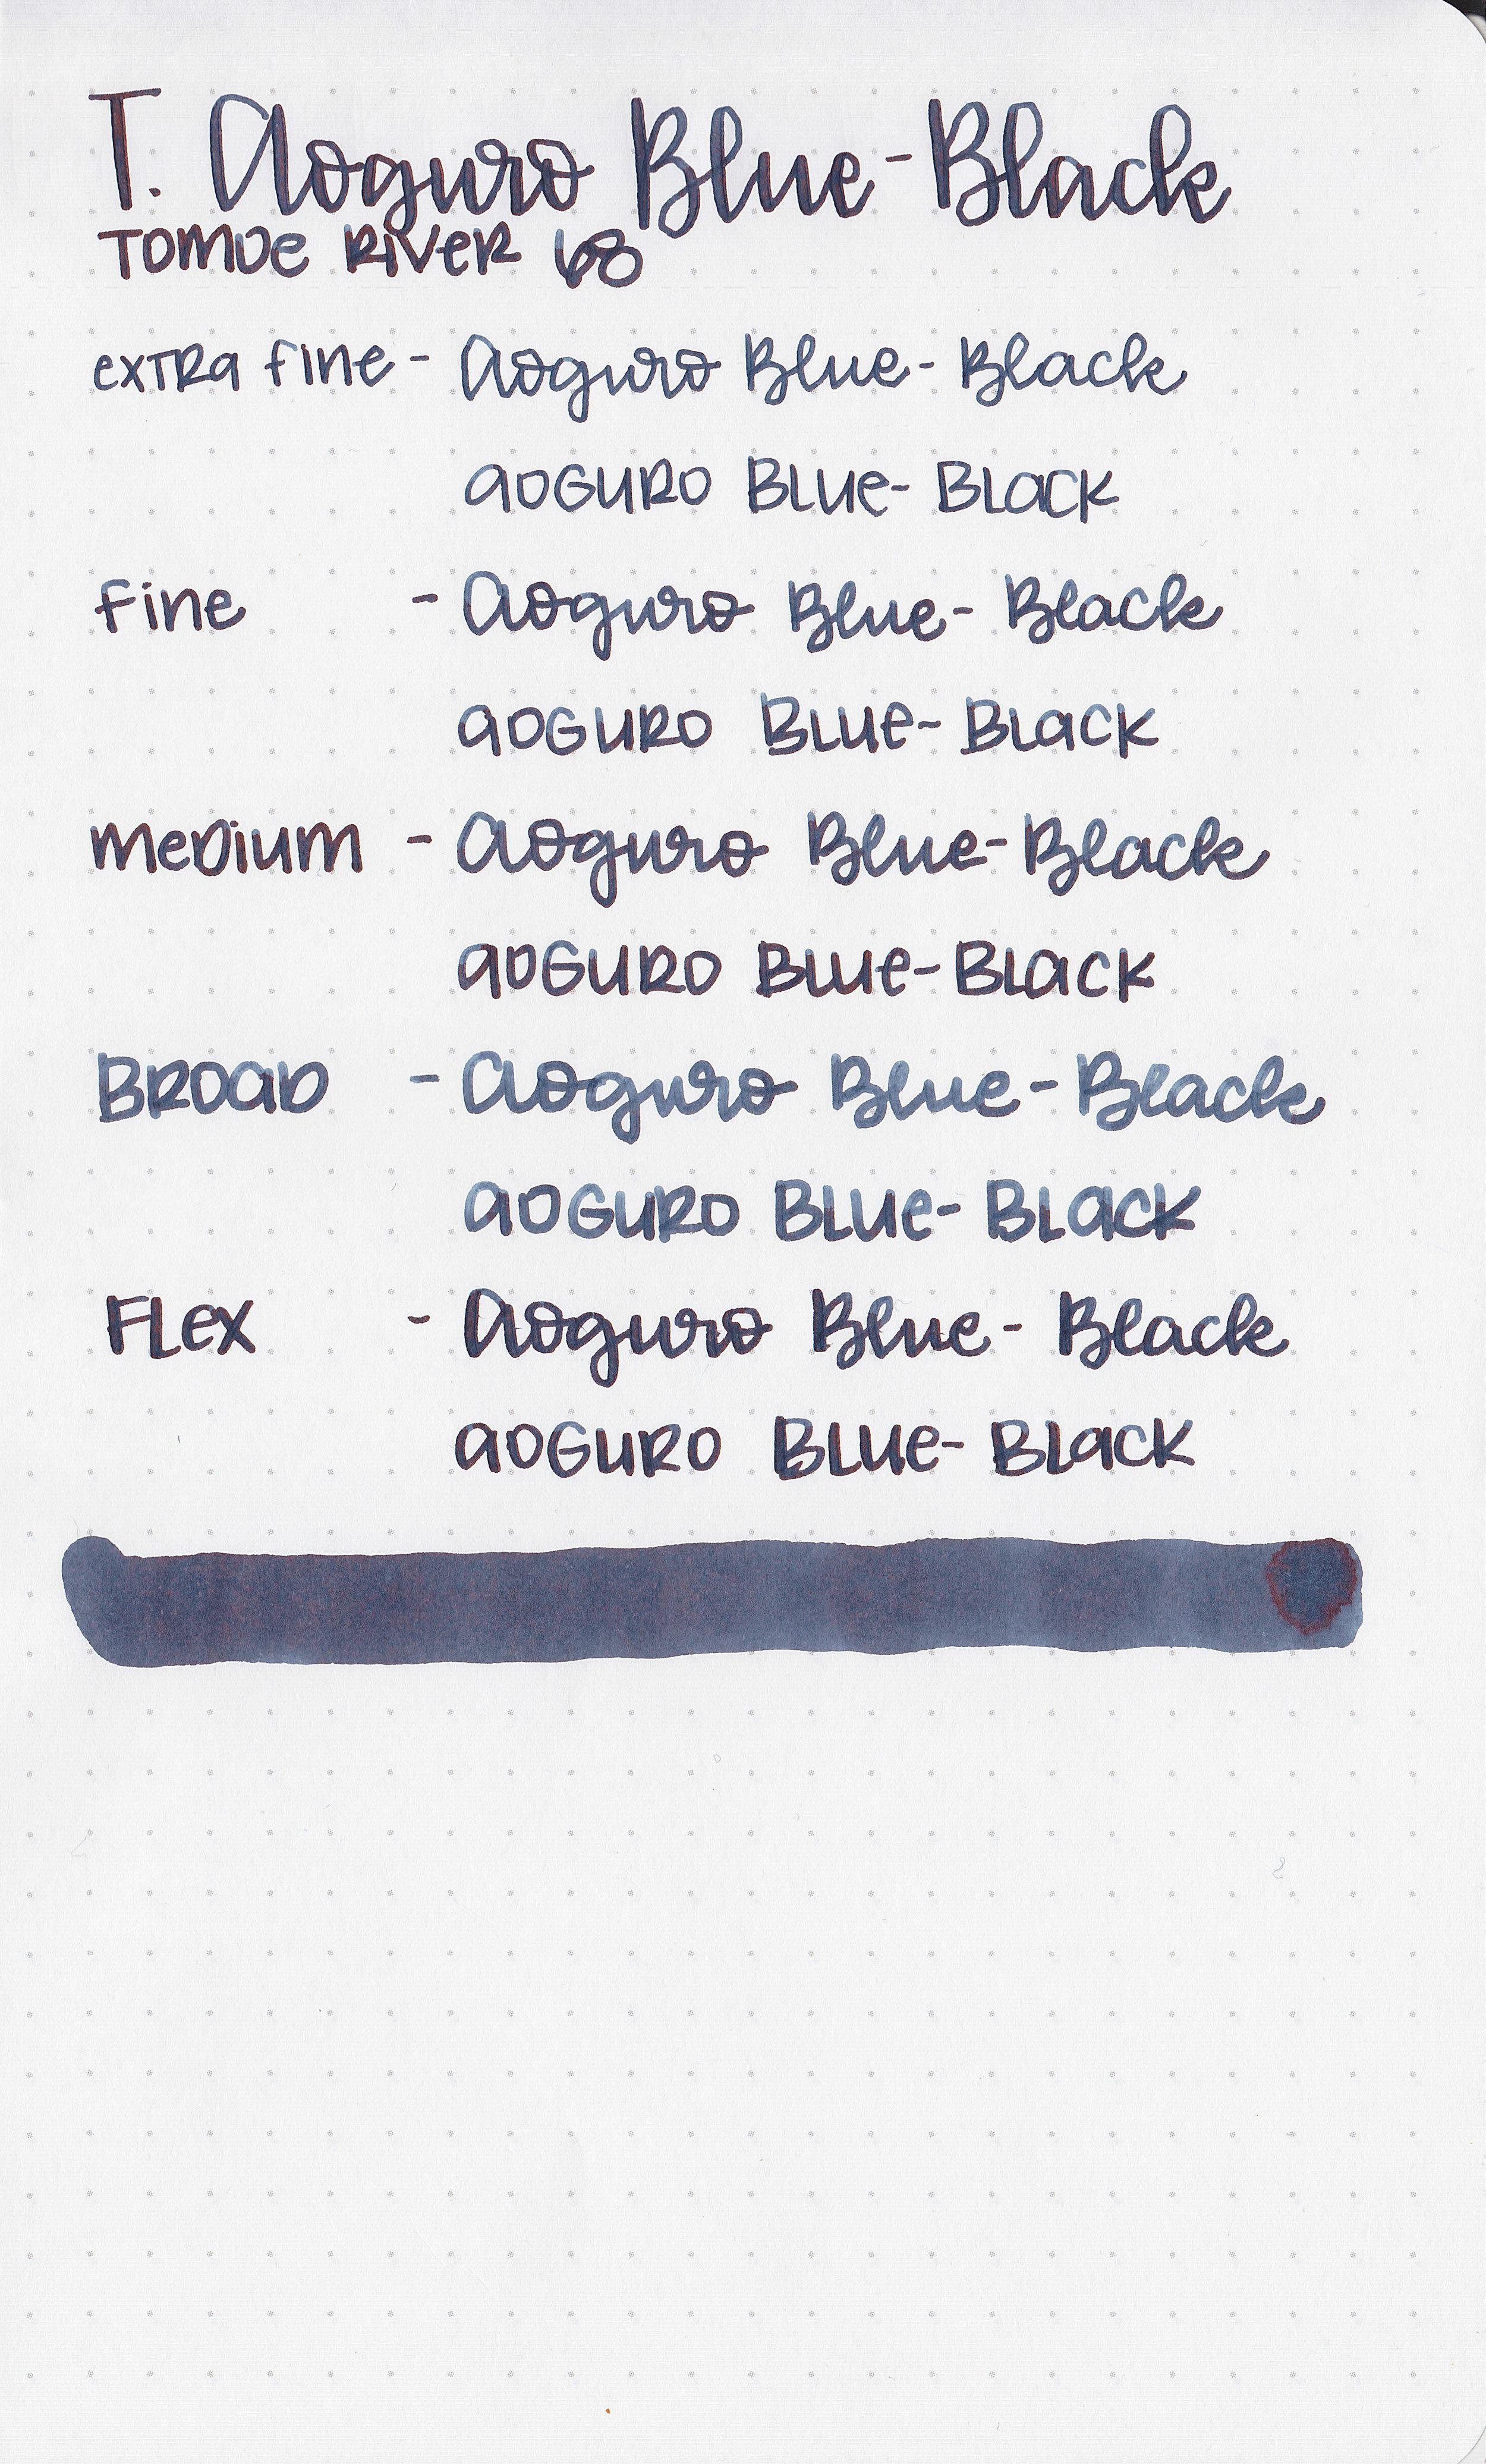 tac-aoguro-blue-black-9.jpg